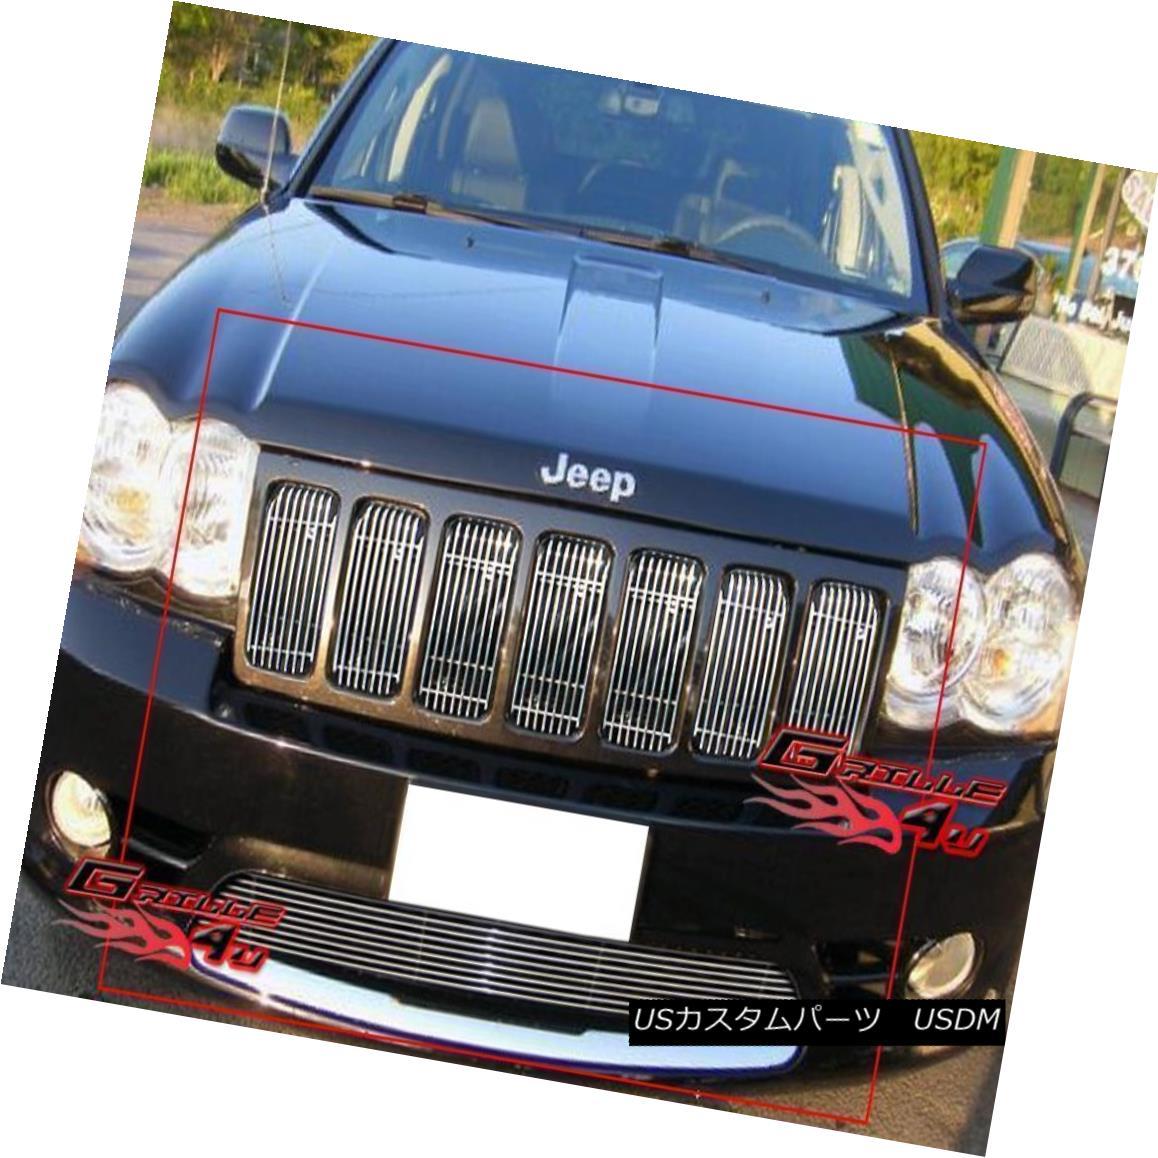 USグリル Fits 09-2010 Jeep Grand Cherokee SRT8 Billet Grille Grill Combo Insert フィット09-2010ジープグランドチェロキーSRT8ビレットグリルグリルコンボインサート